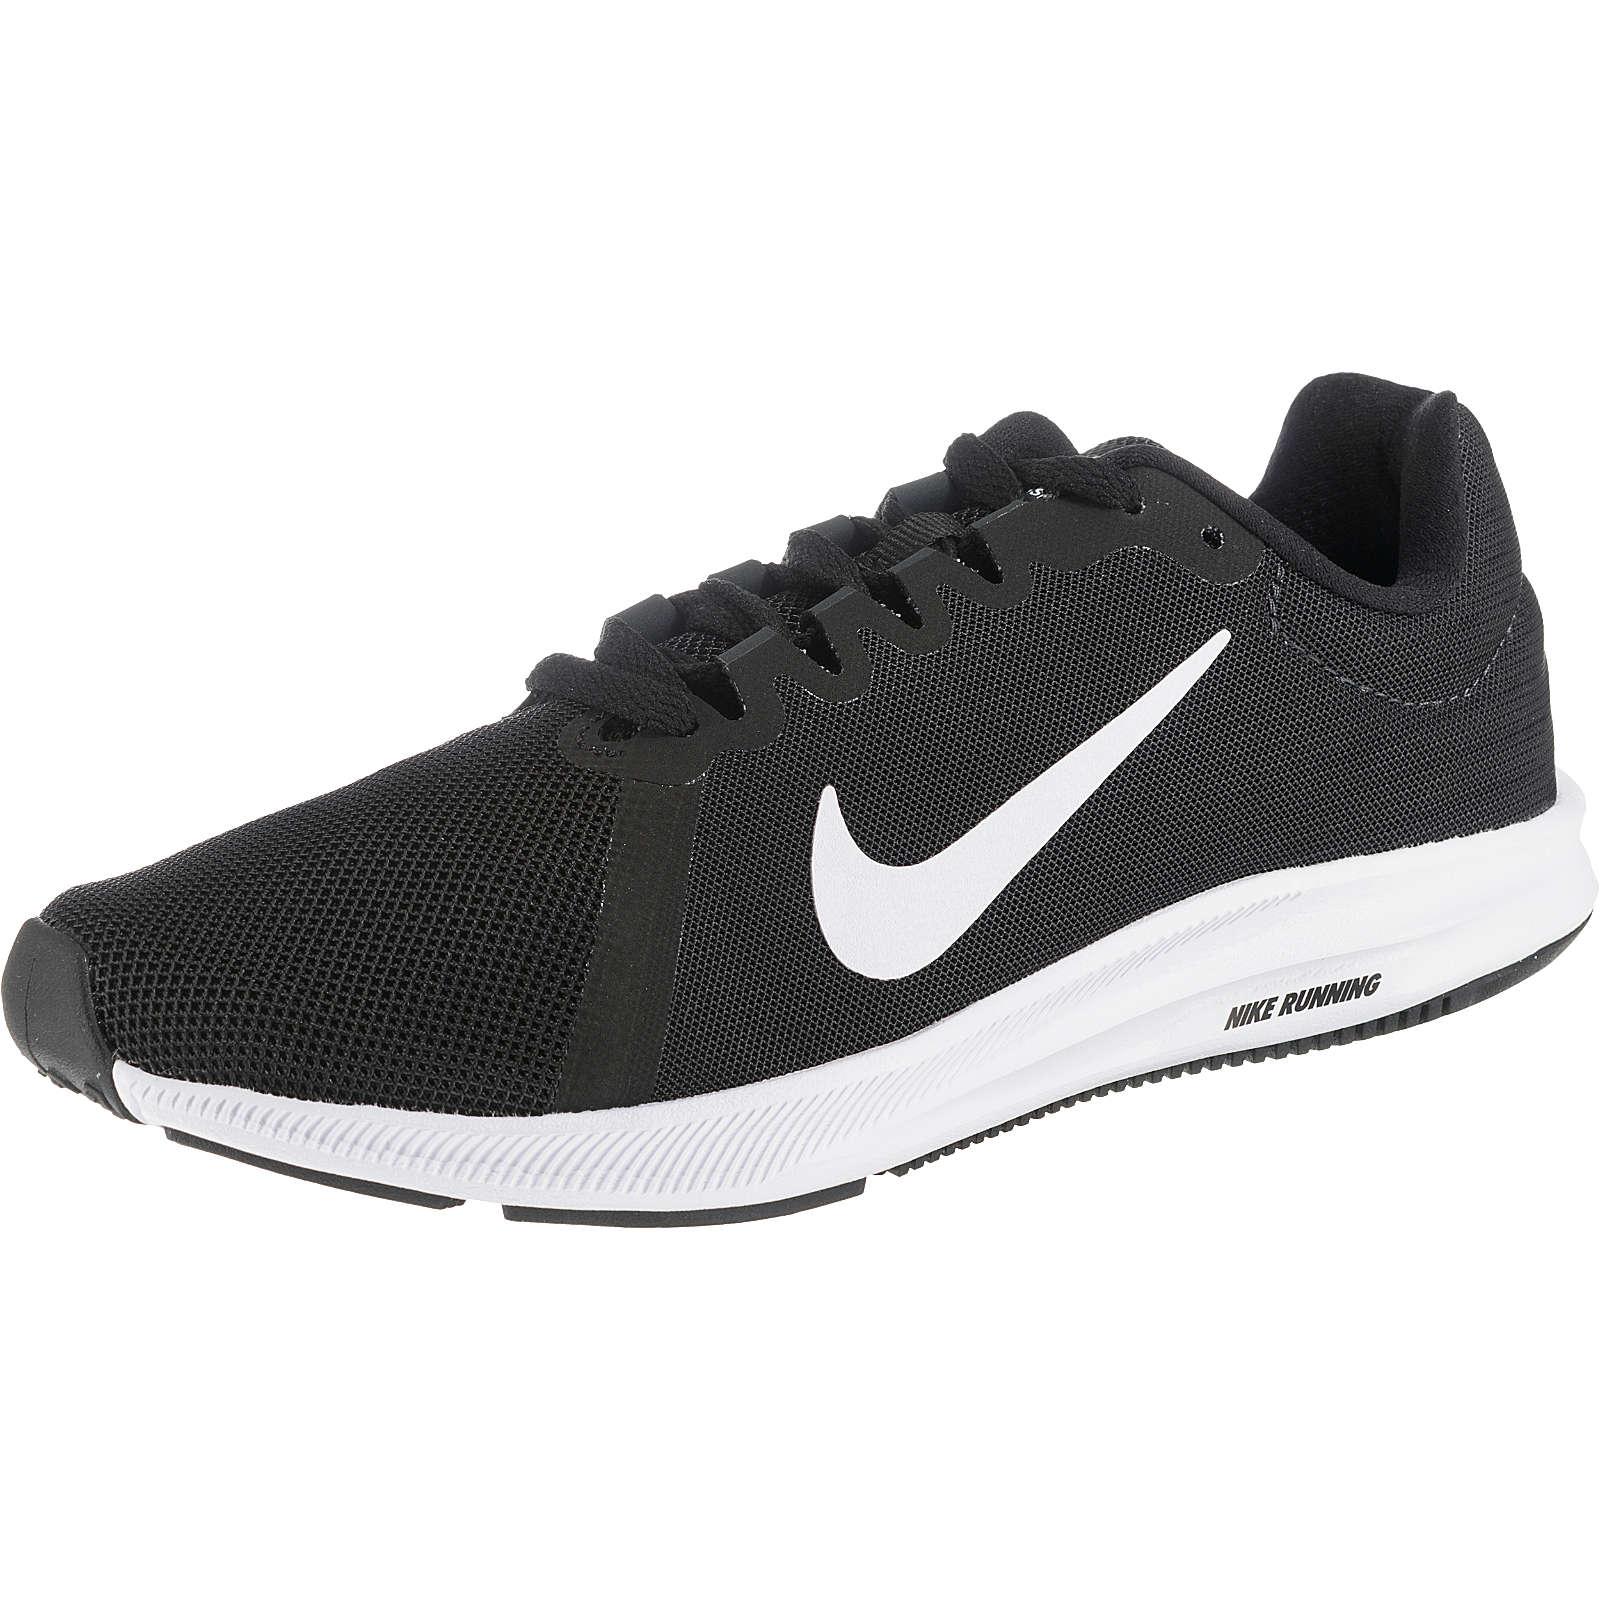 Nike Performance Downshifter 8 Laufschuhe schwarz-kombi Damen Gr. 40